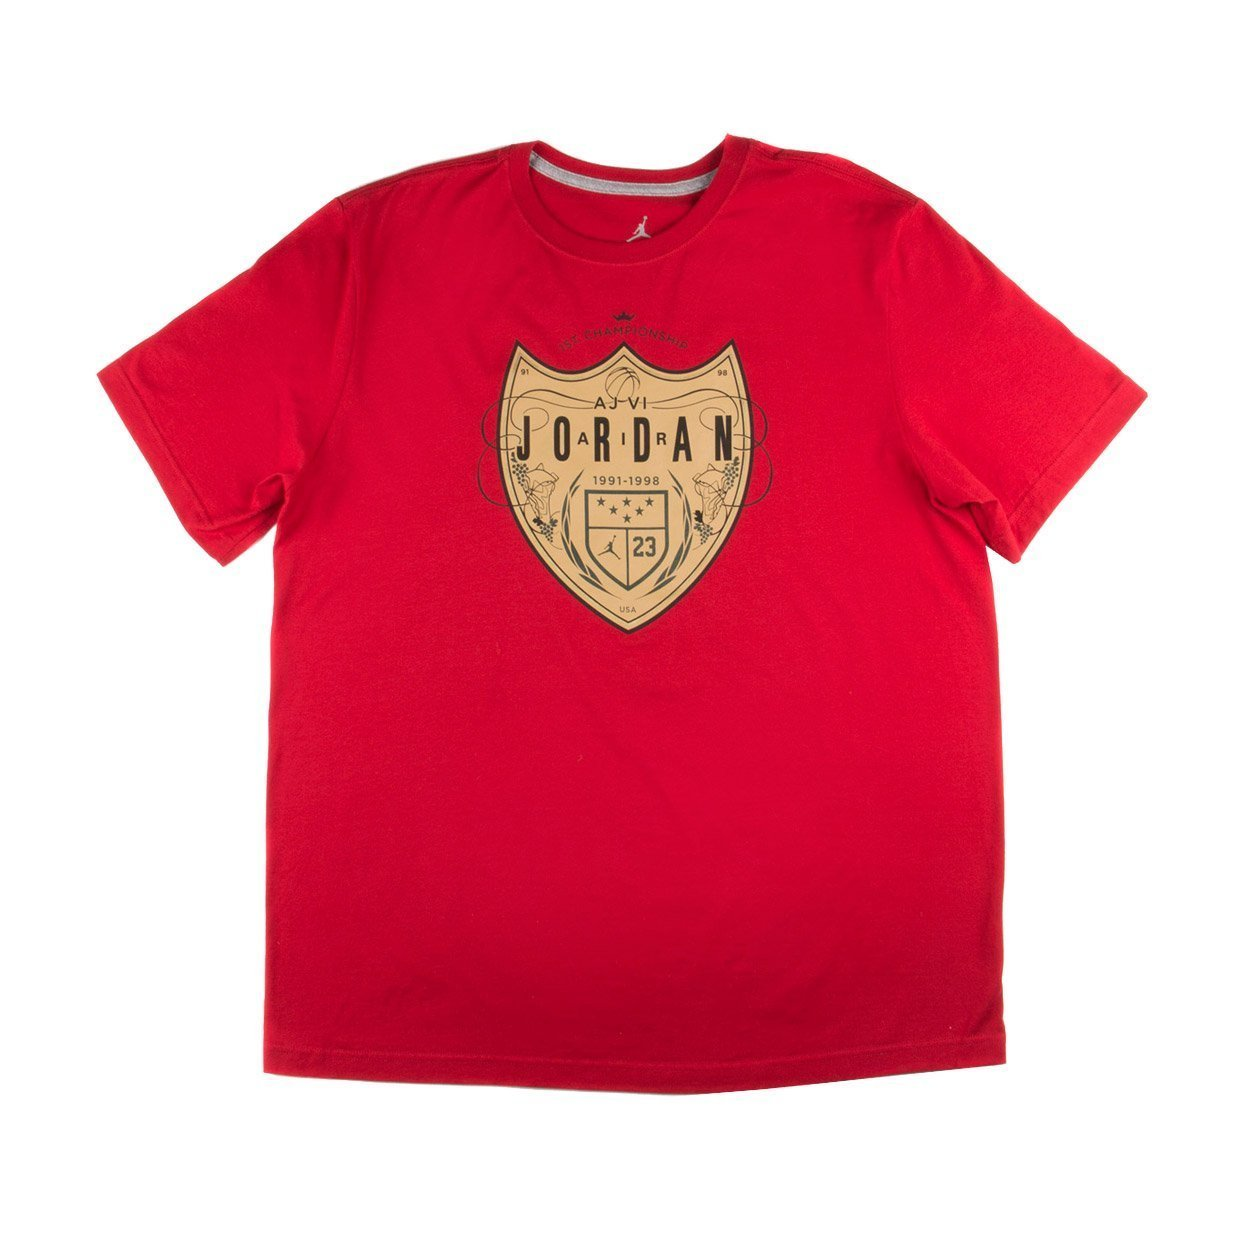 d623ef0d8e0d Get Quotations · Jordan Men s Jordan Champagne T-Shirt X-Large Red